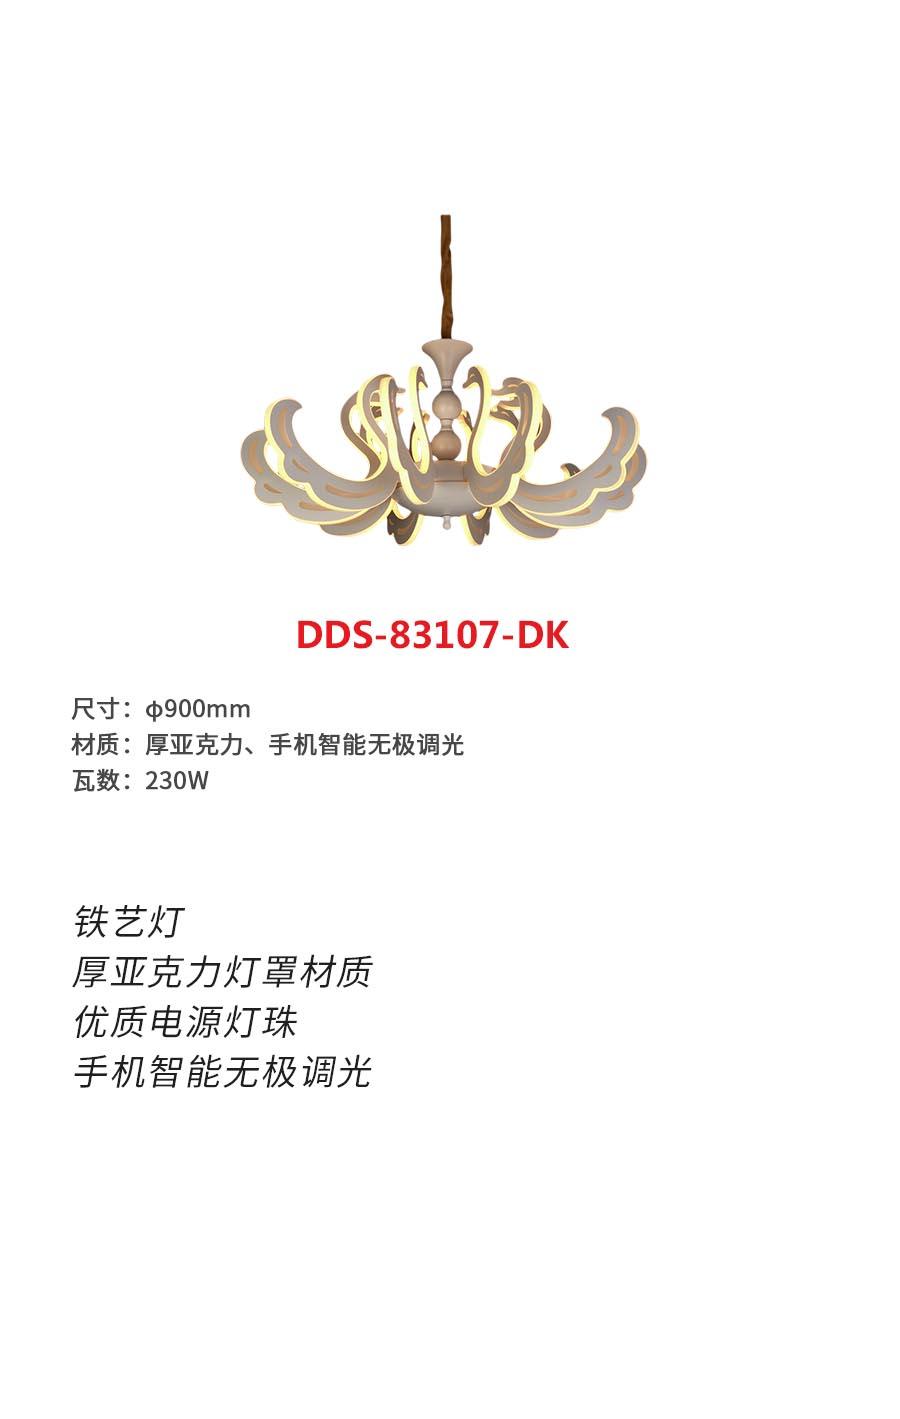 DDS-83107-dkb.jpg